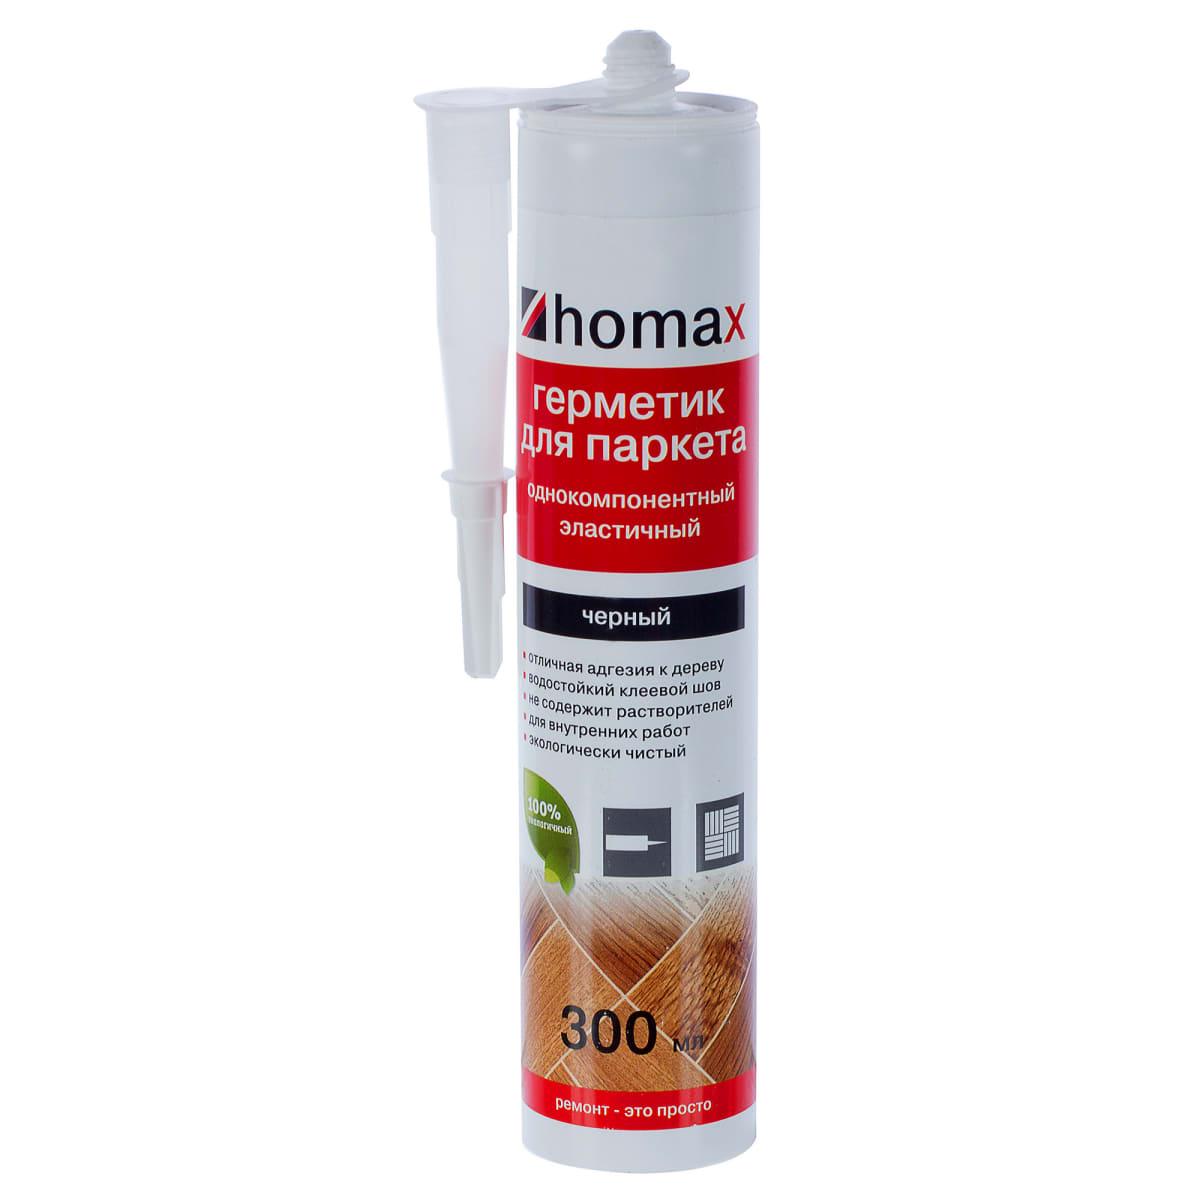 Герметик Homax для паркета 300 мл цвет чёрный